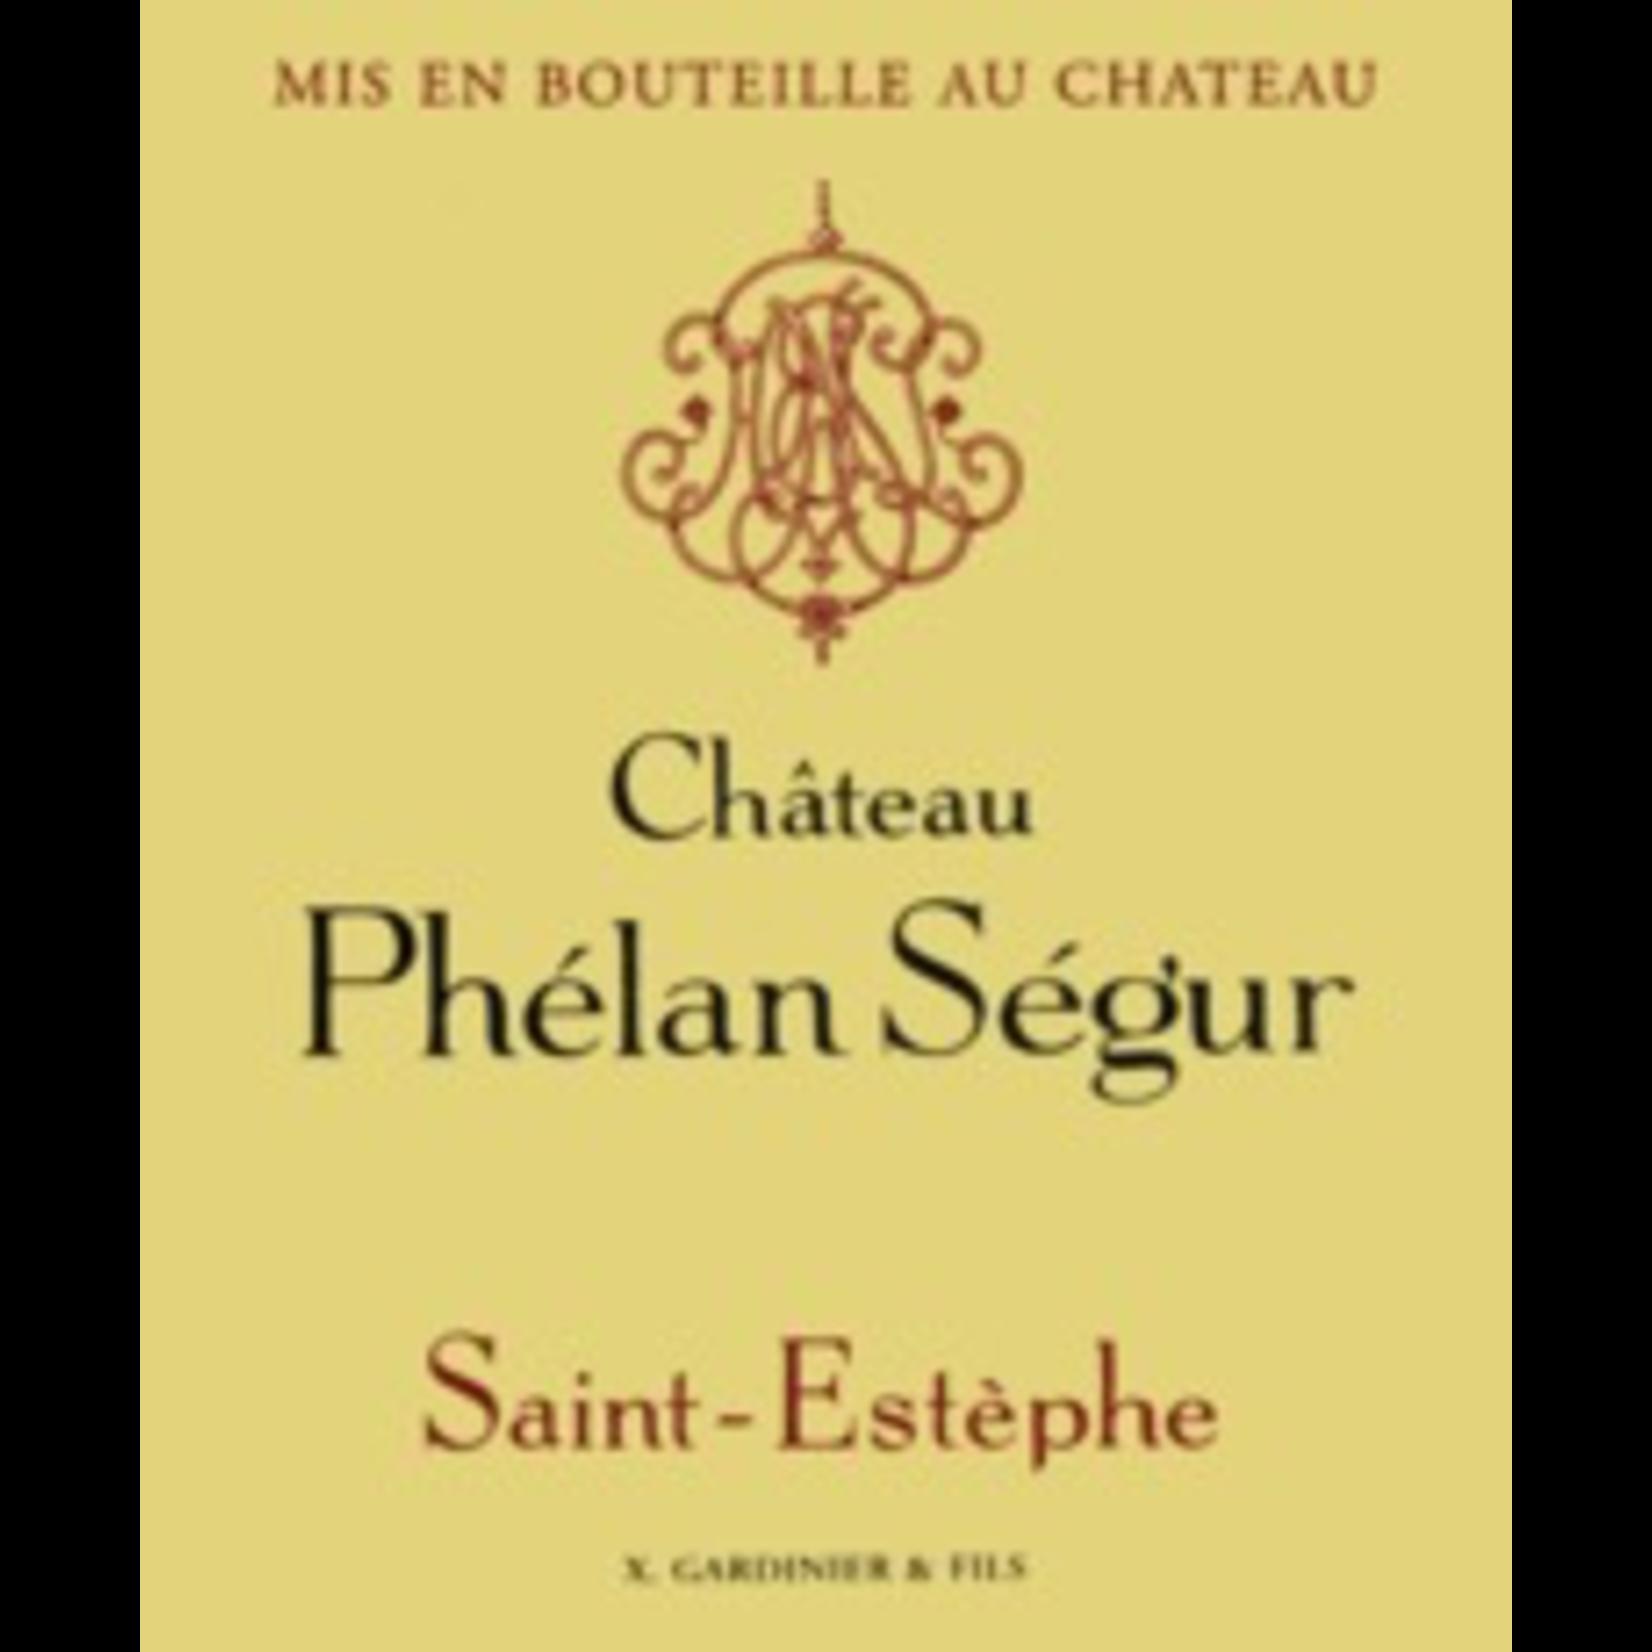 Wine Ch Phelan Segur 2018